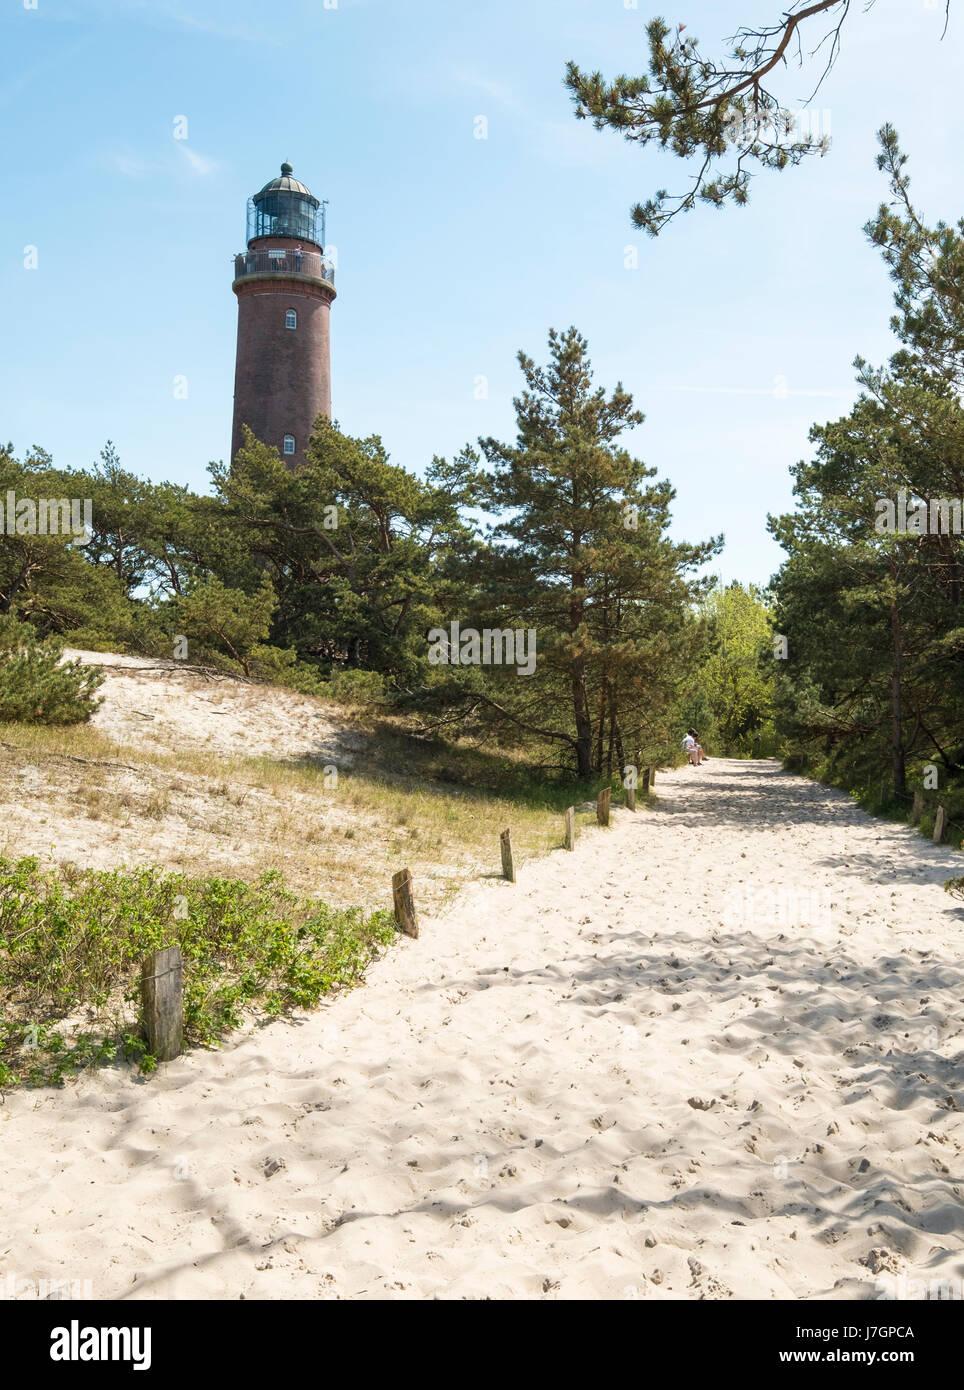 Lighthouse in Darsser Ort, Prerow, Darss, Mecklenburg-Vorpommern, Germany - Stock Image